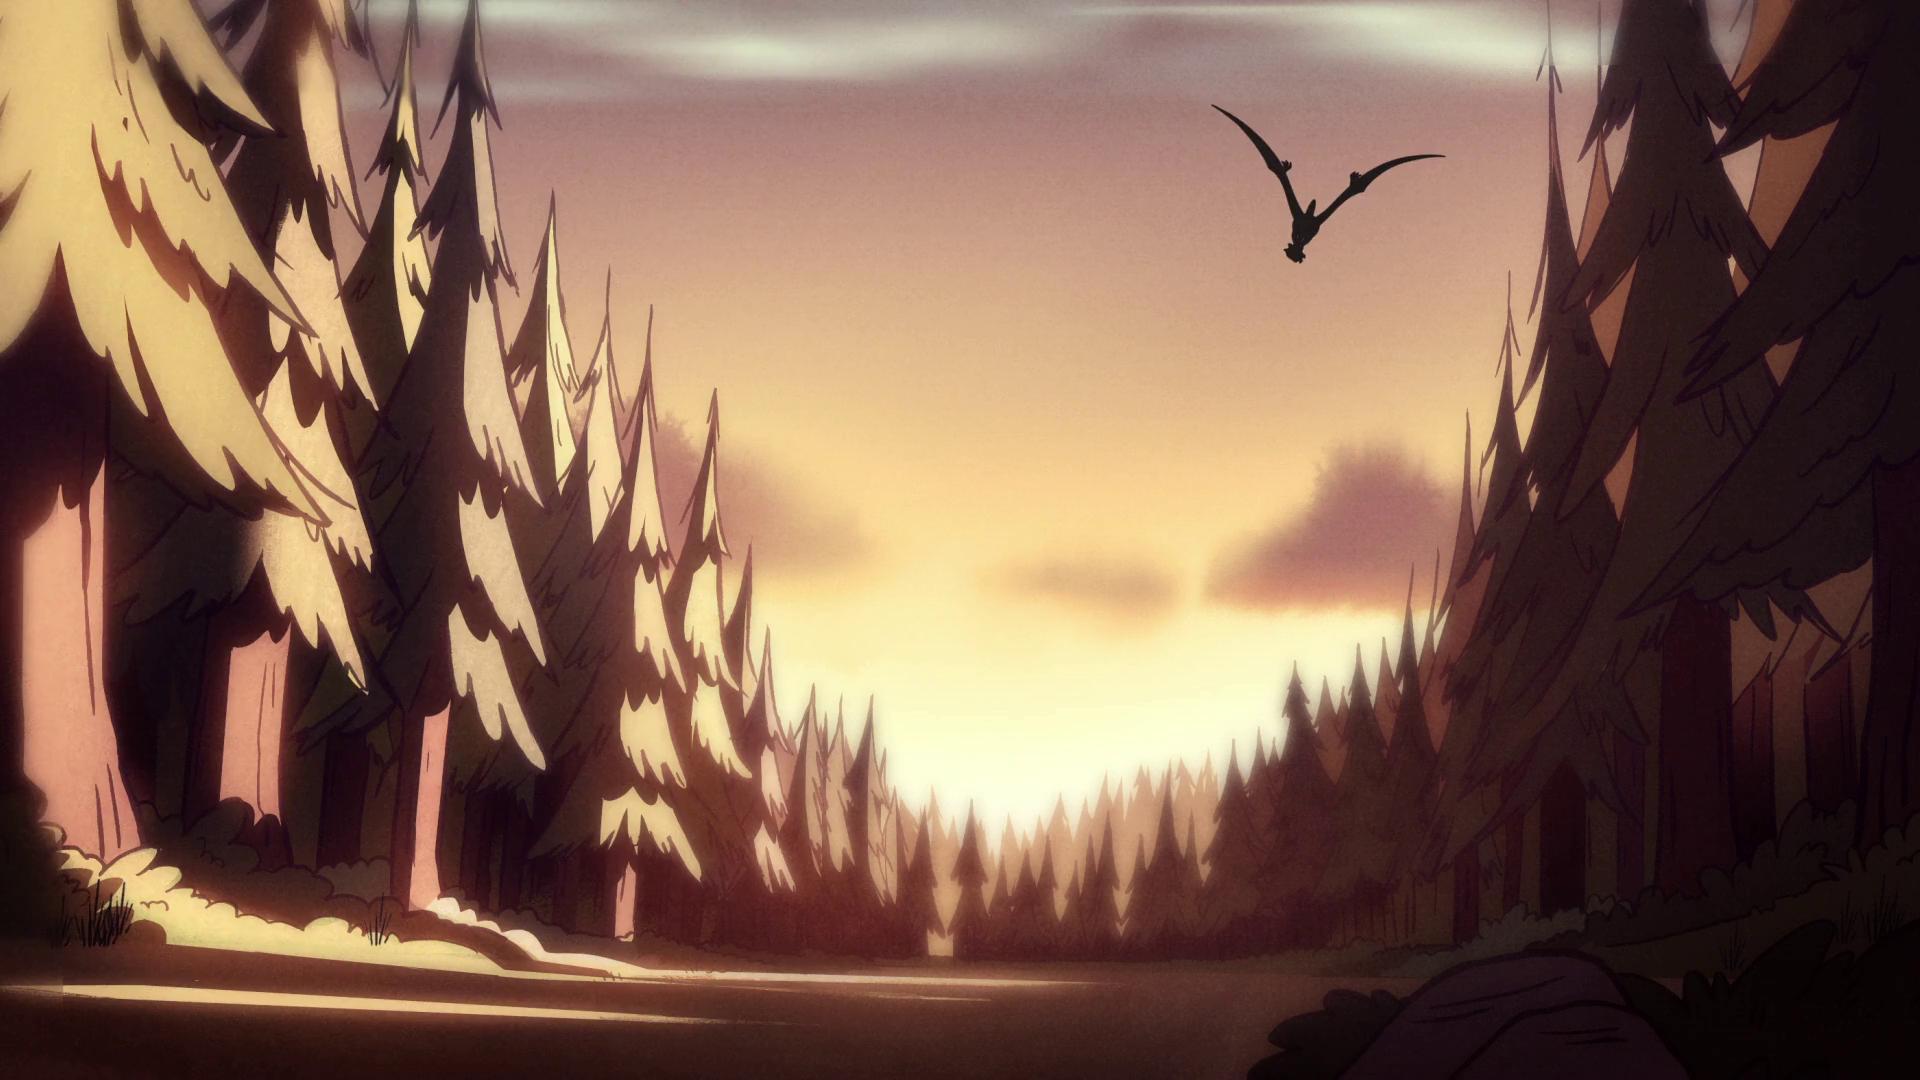 Gravity Falls HD Wallpapers - Wallpaper Cave